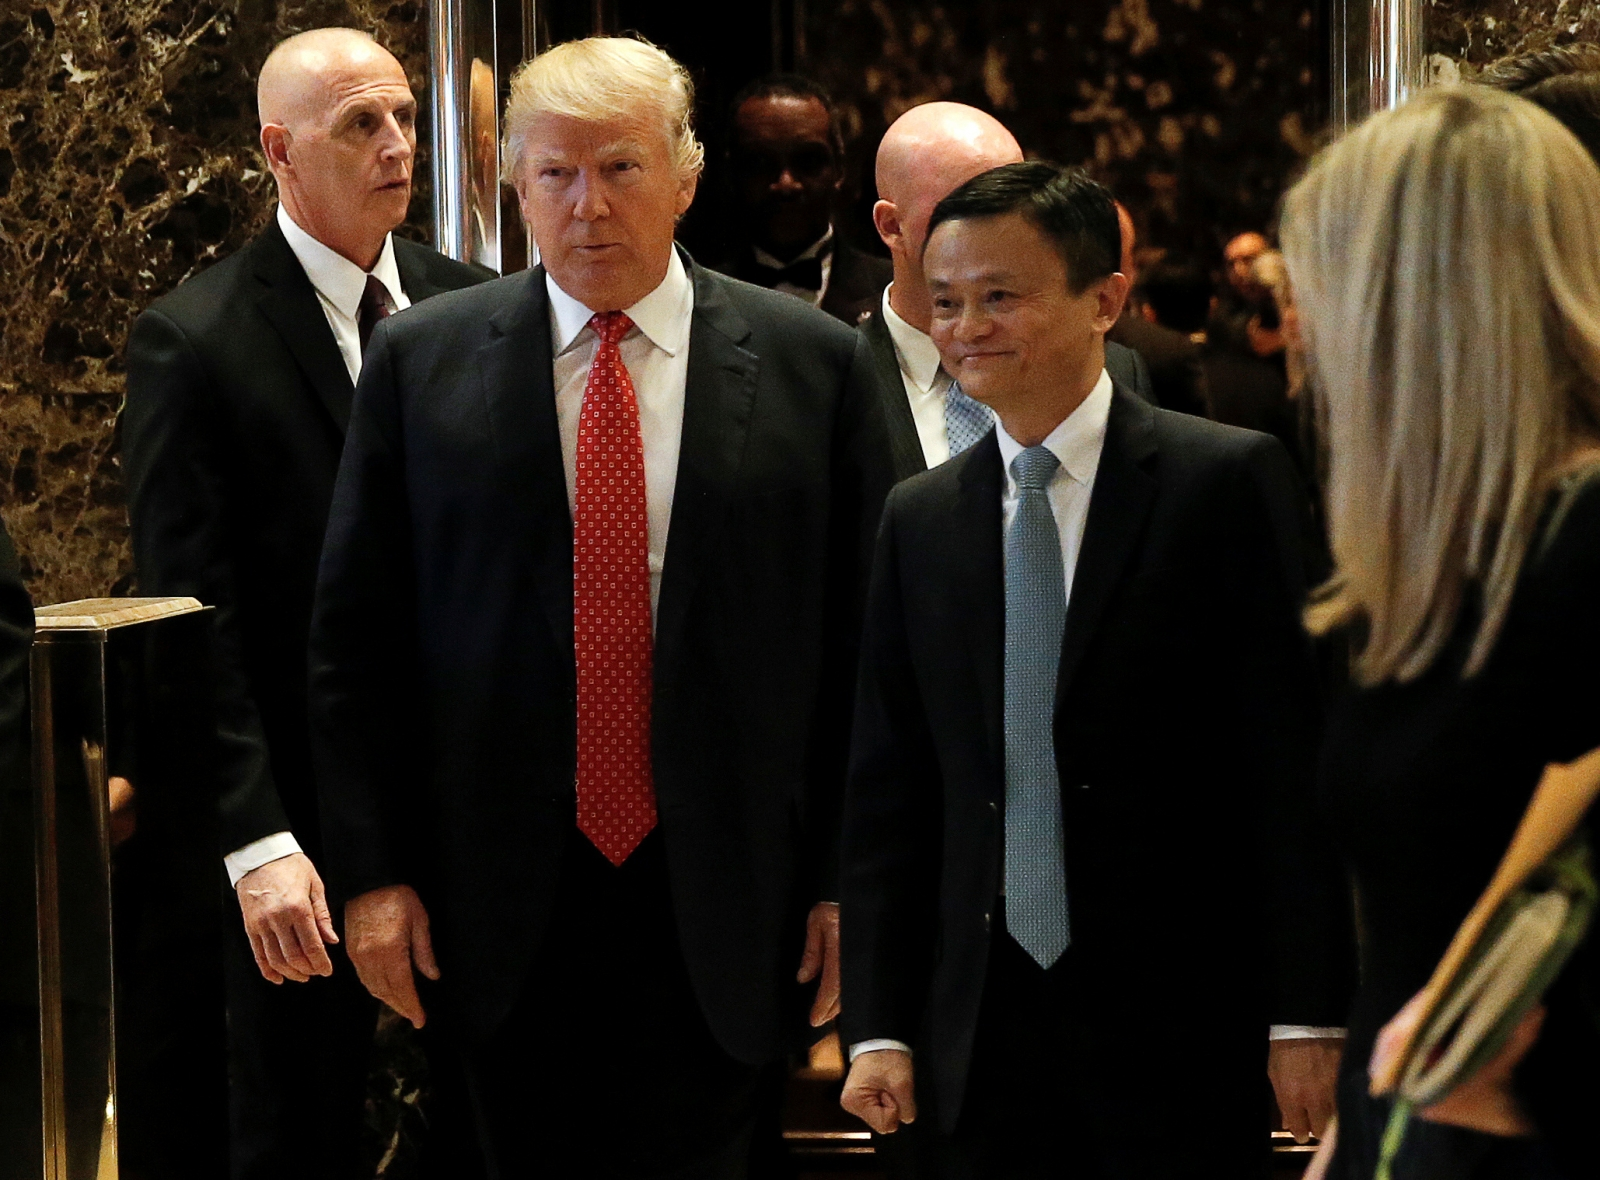 Donald Trump met Alibaba founder, Jack Ma